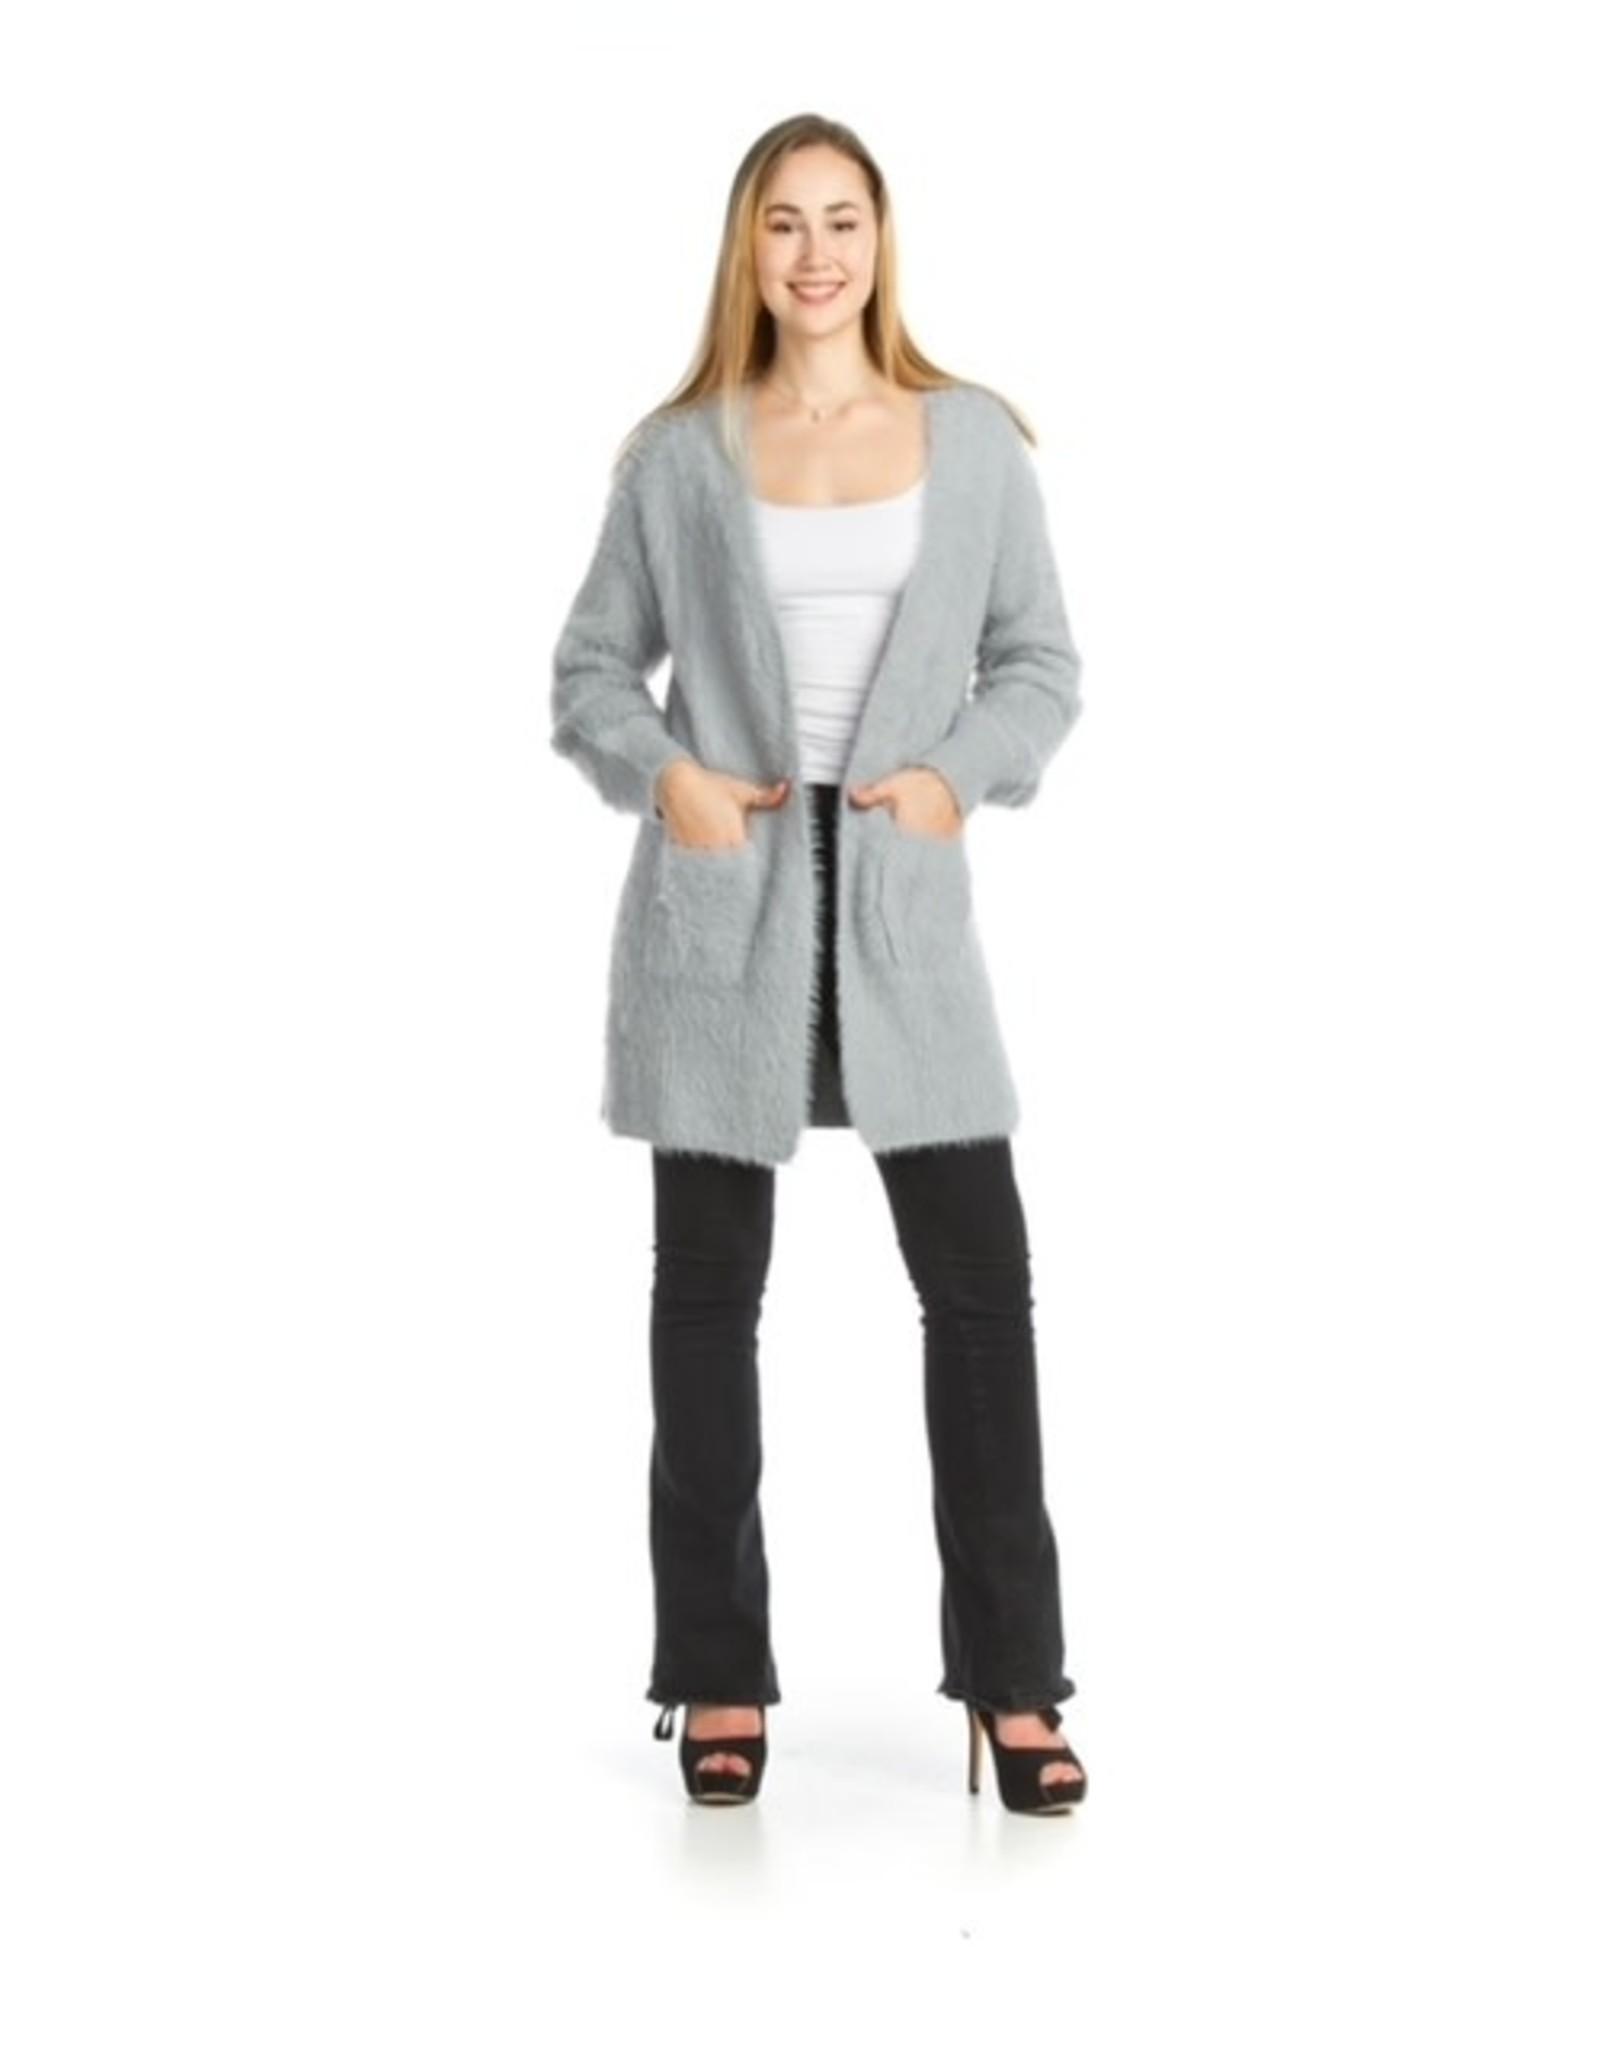 Papillon Papillon - Fuzzy cardigan with pockets (grey)